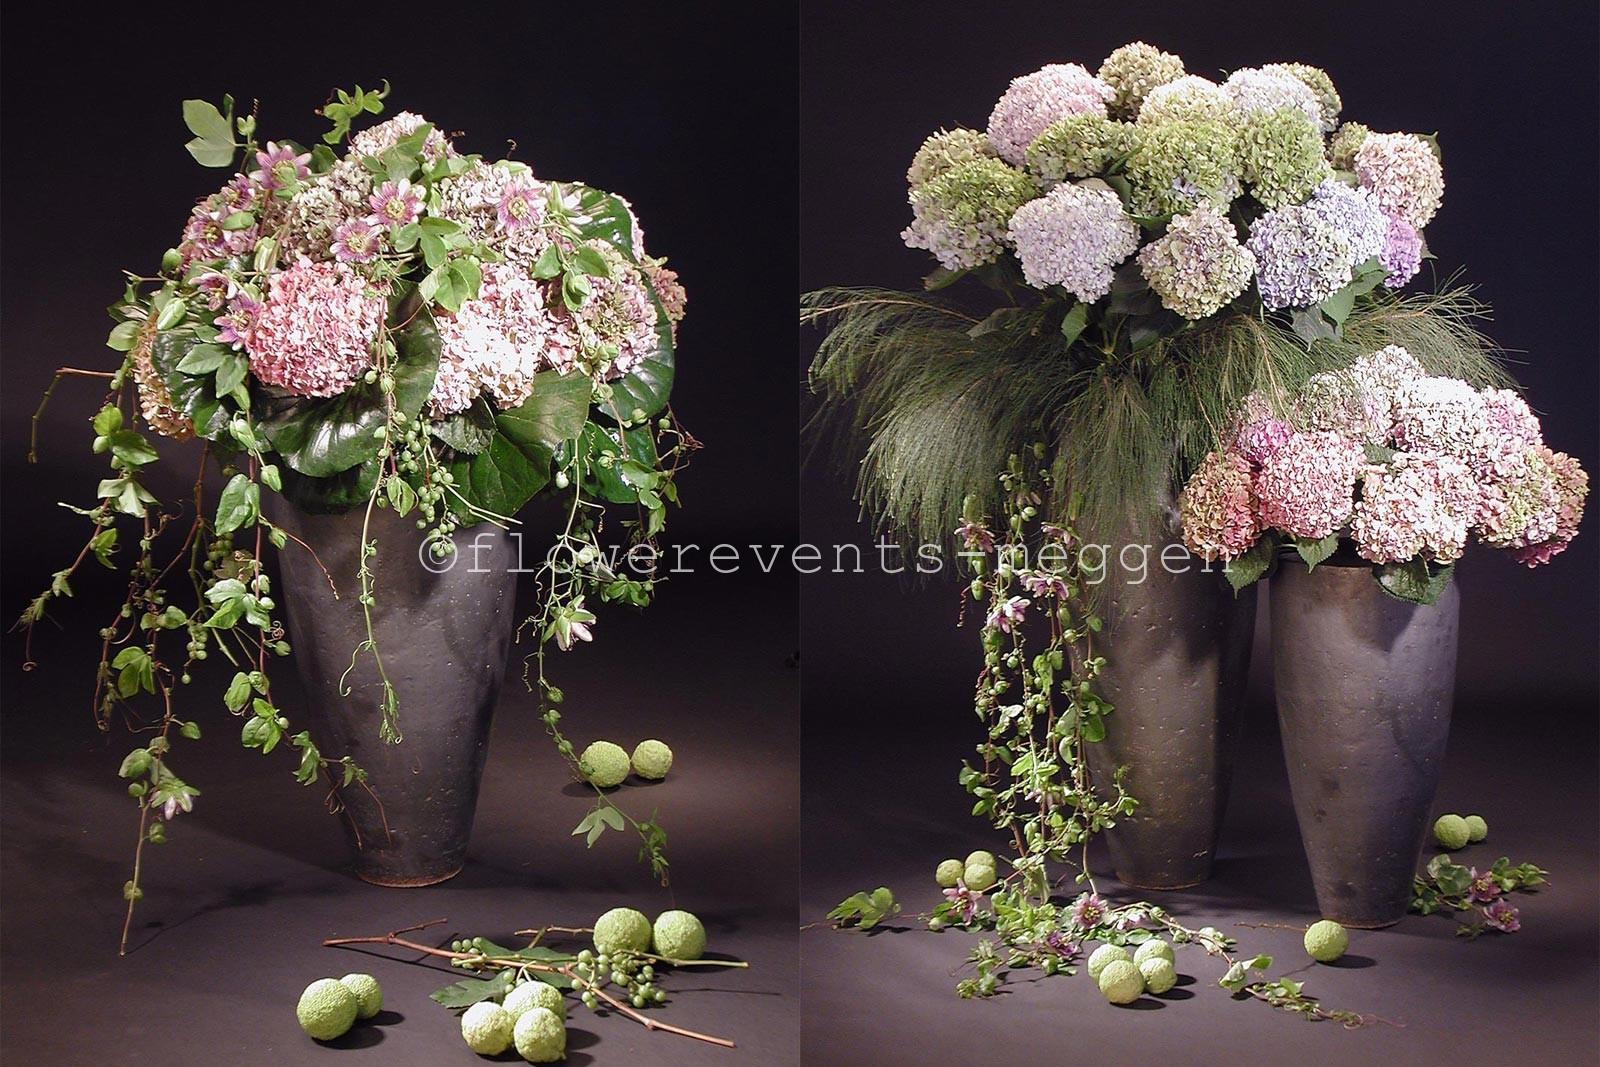 blume luzern blumen flower events meggen k ssnacht online. Black Bedroom Furniture Sets. Home Design Ideas